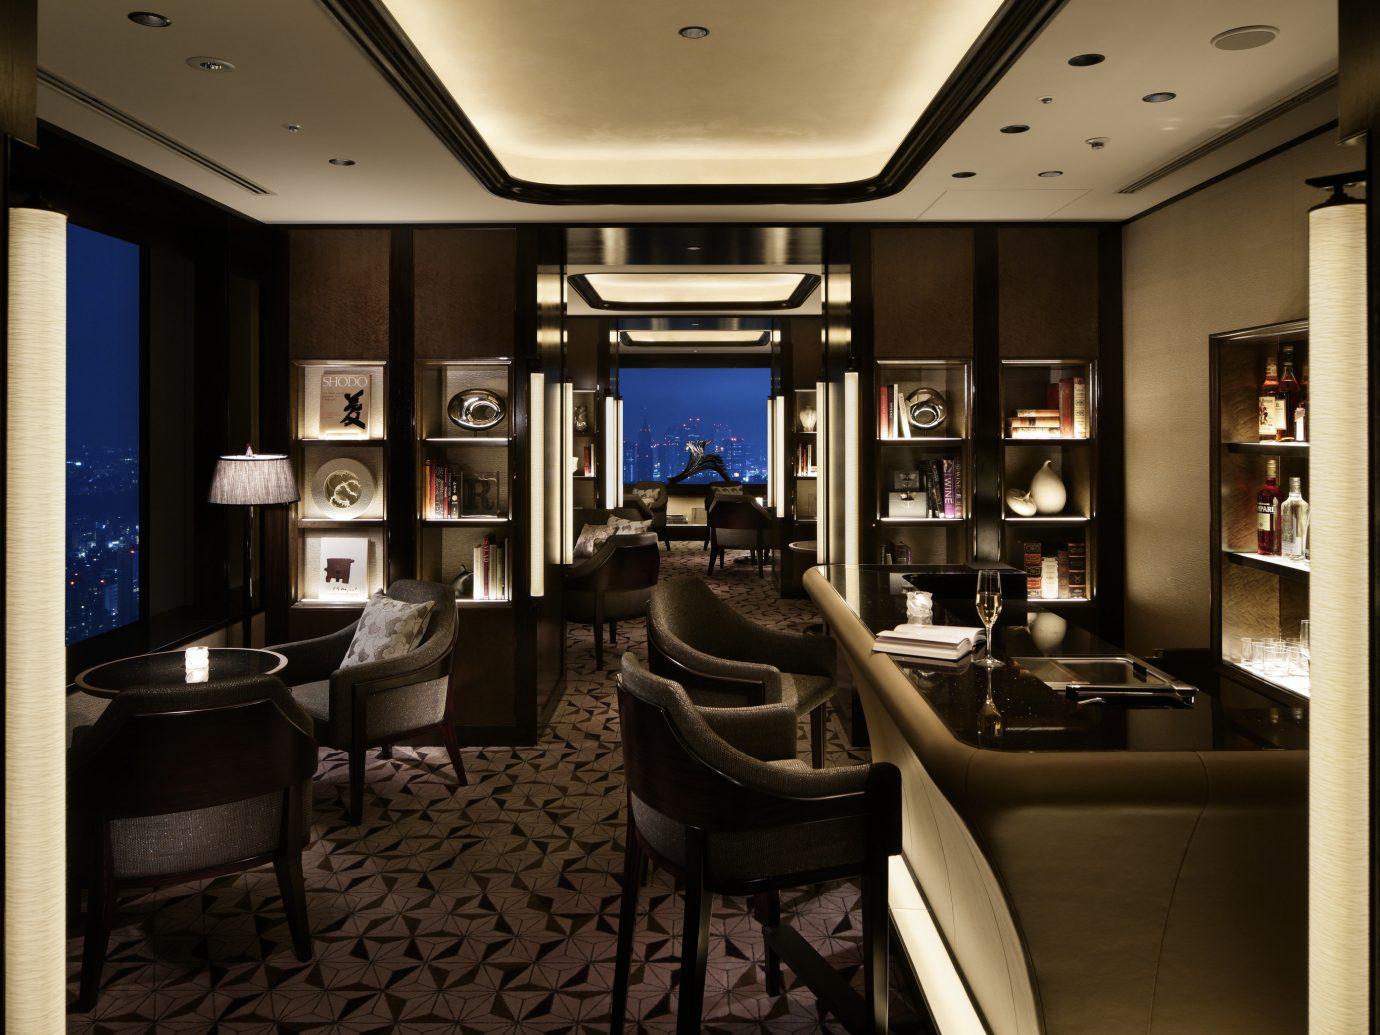 Hotels Romance indoor ceiling floor room interior design home lighting estate Design furniture